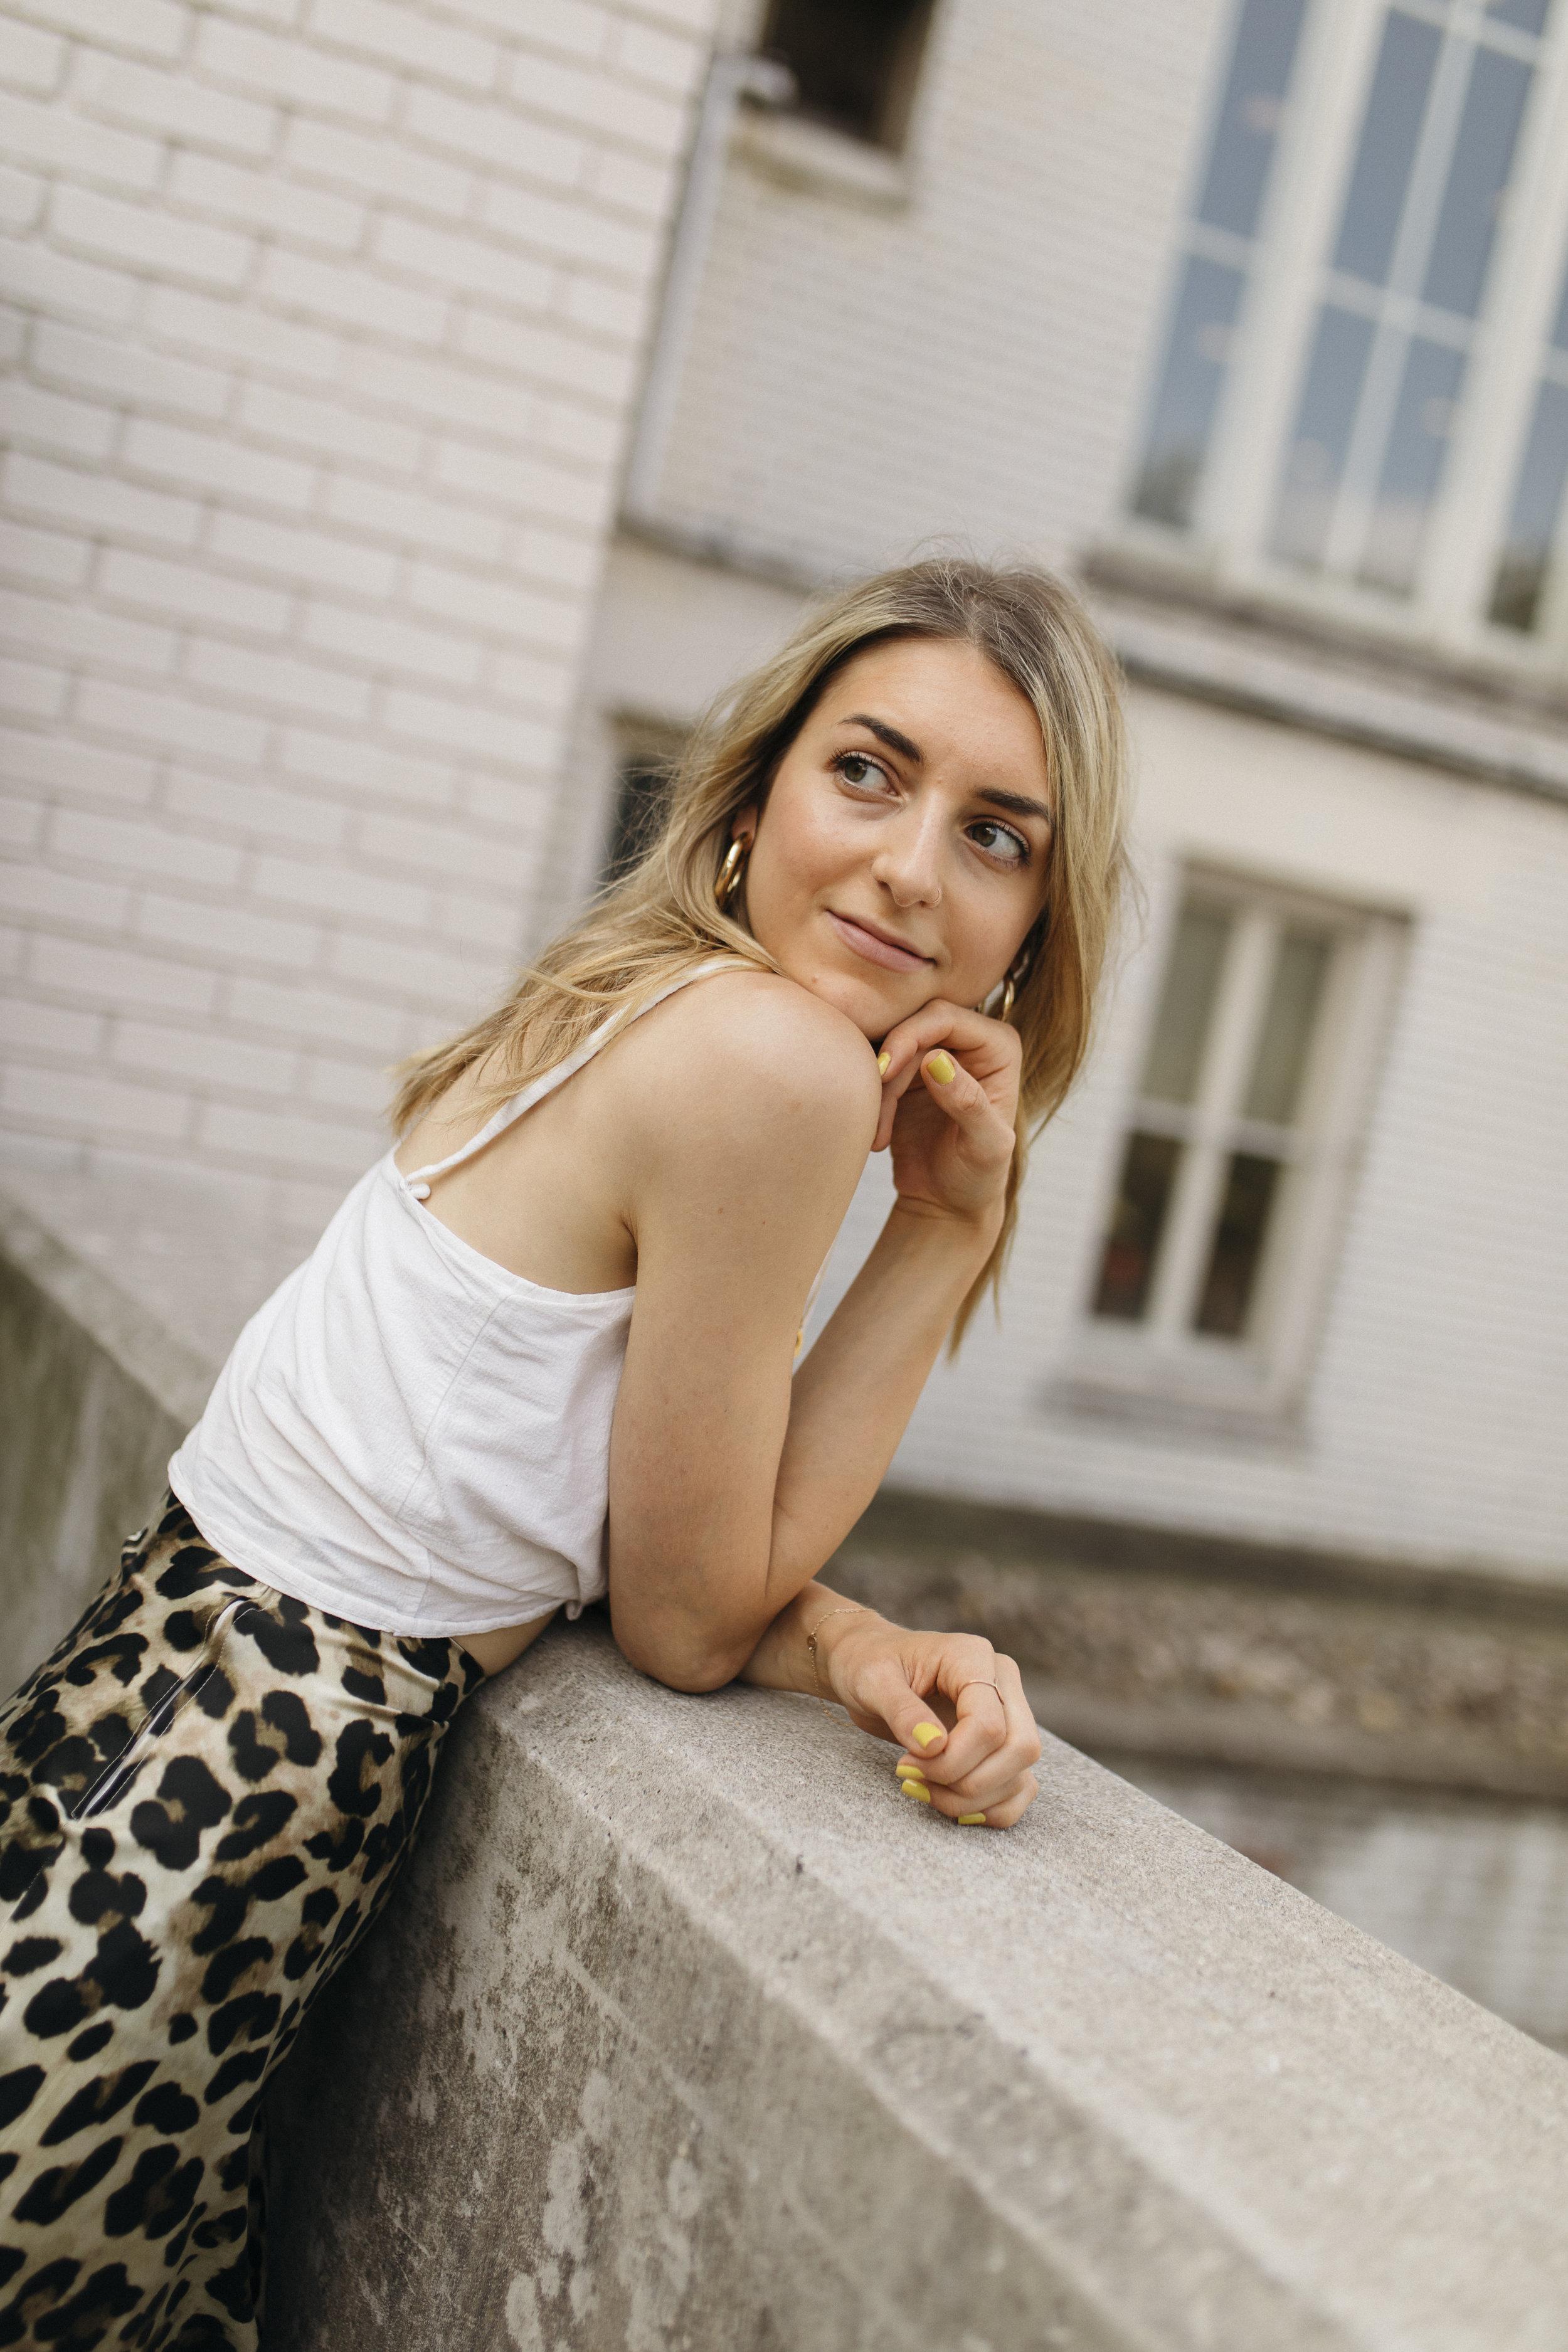 emilyrhess-blog-trends-fashion-leopard-cheetah-skirt-diy-naomi9.jpg